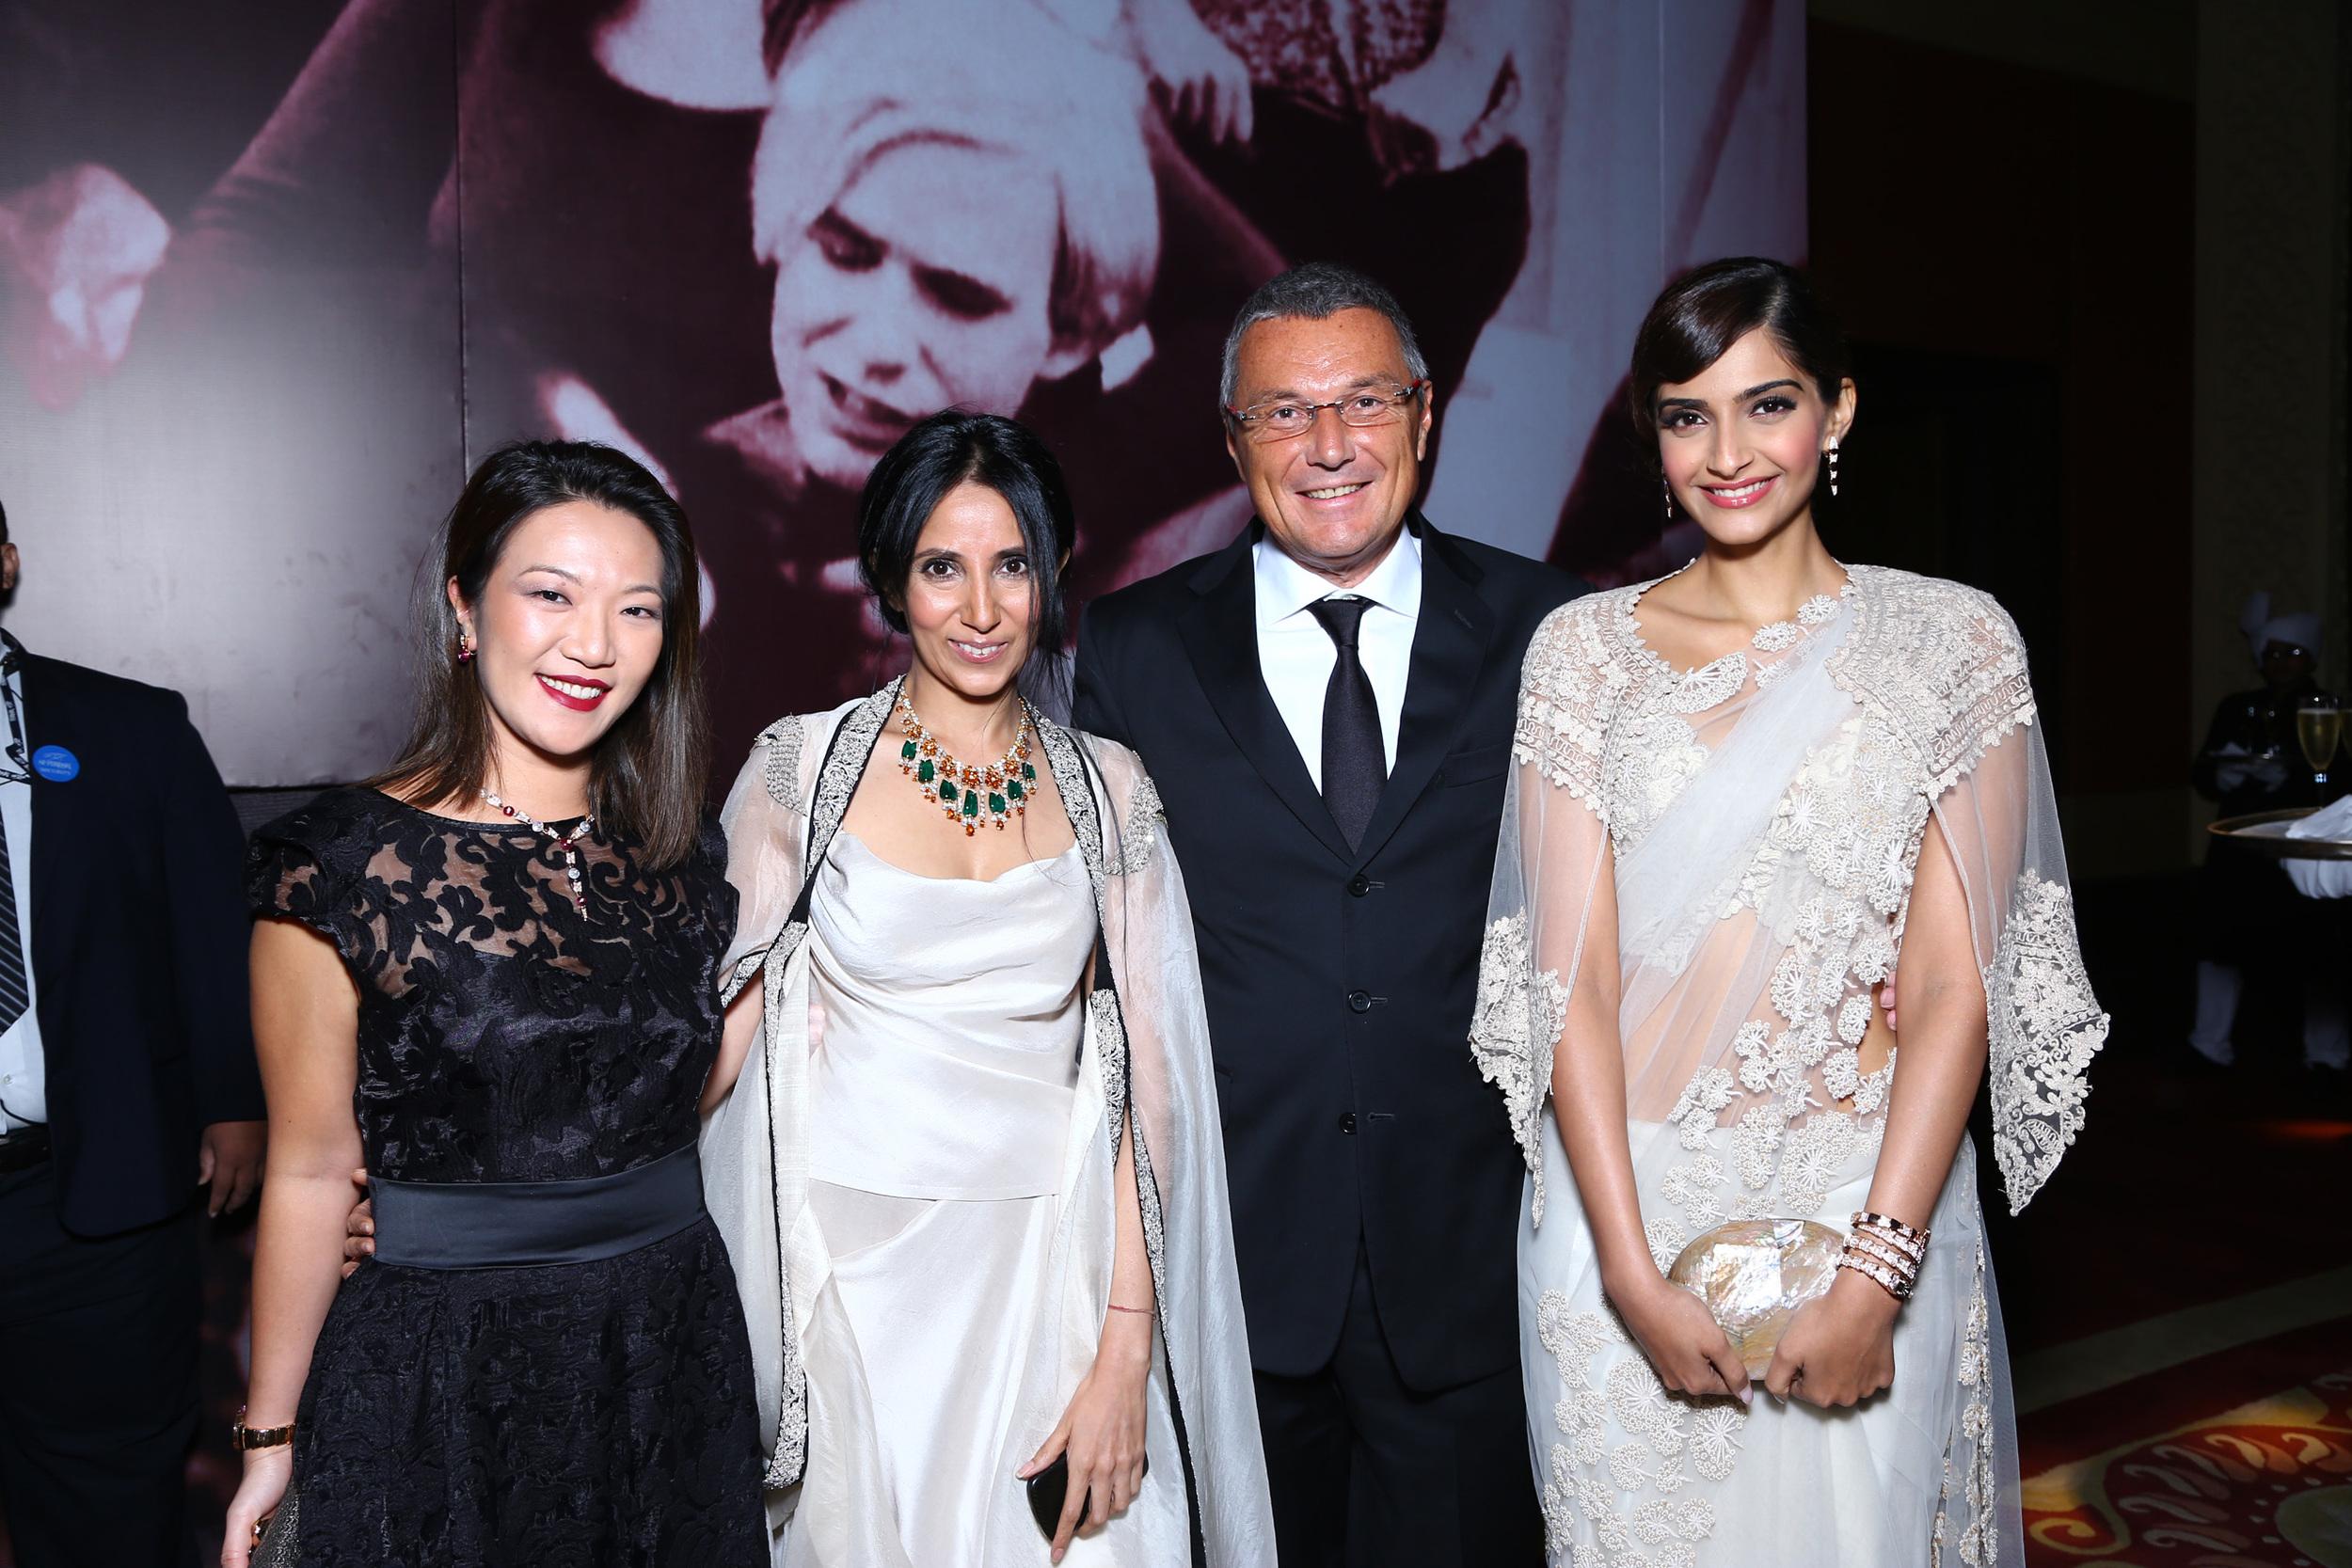 Wei Ling, Anamika Khanna, Arjun Rampal and Sonam Kapoor